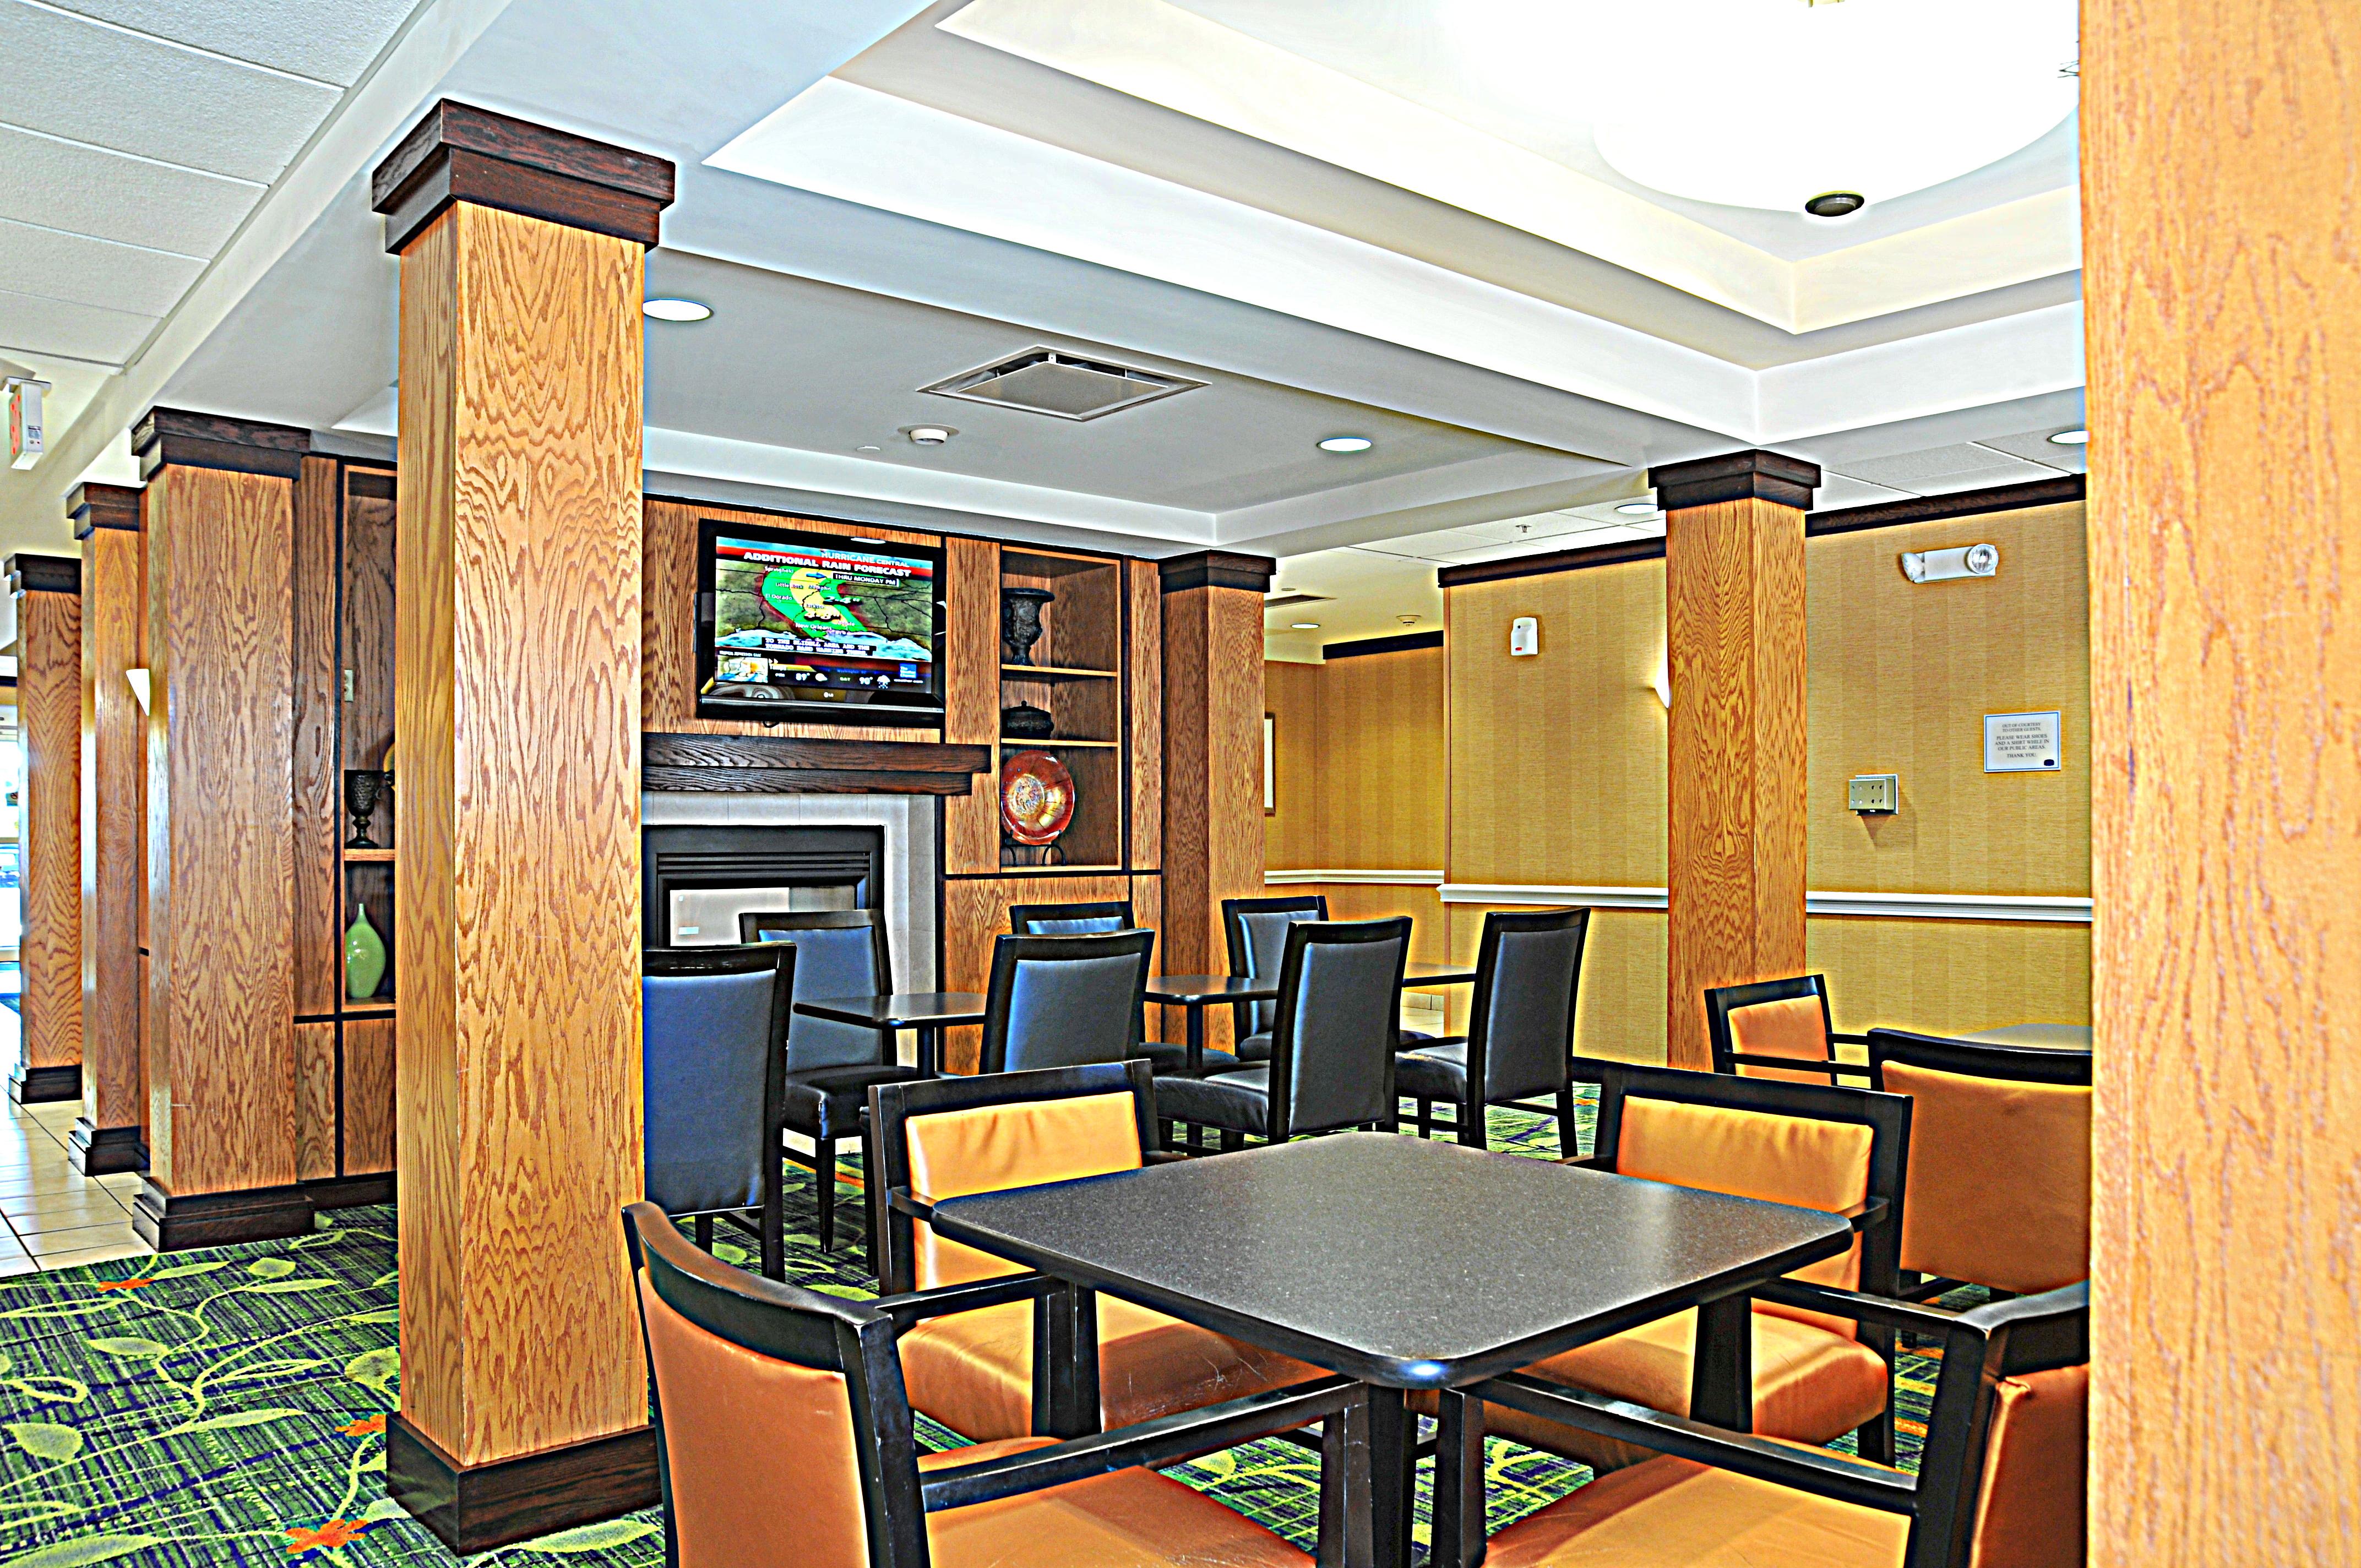 Fairfield Inn & Suites by Marriott Akron South image 44